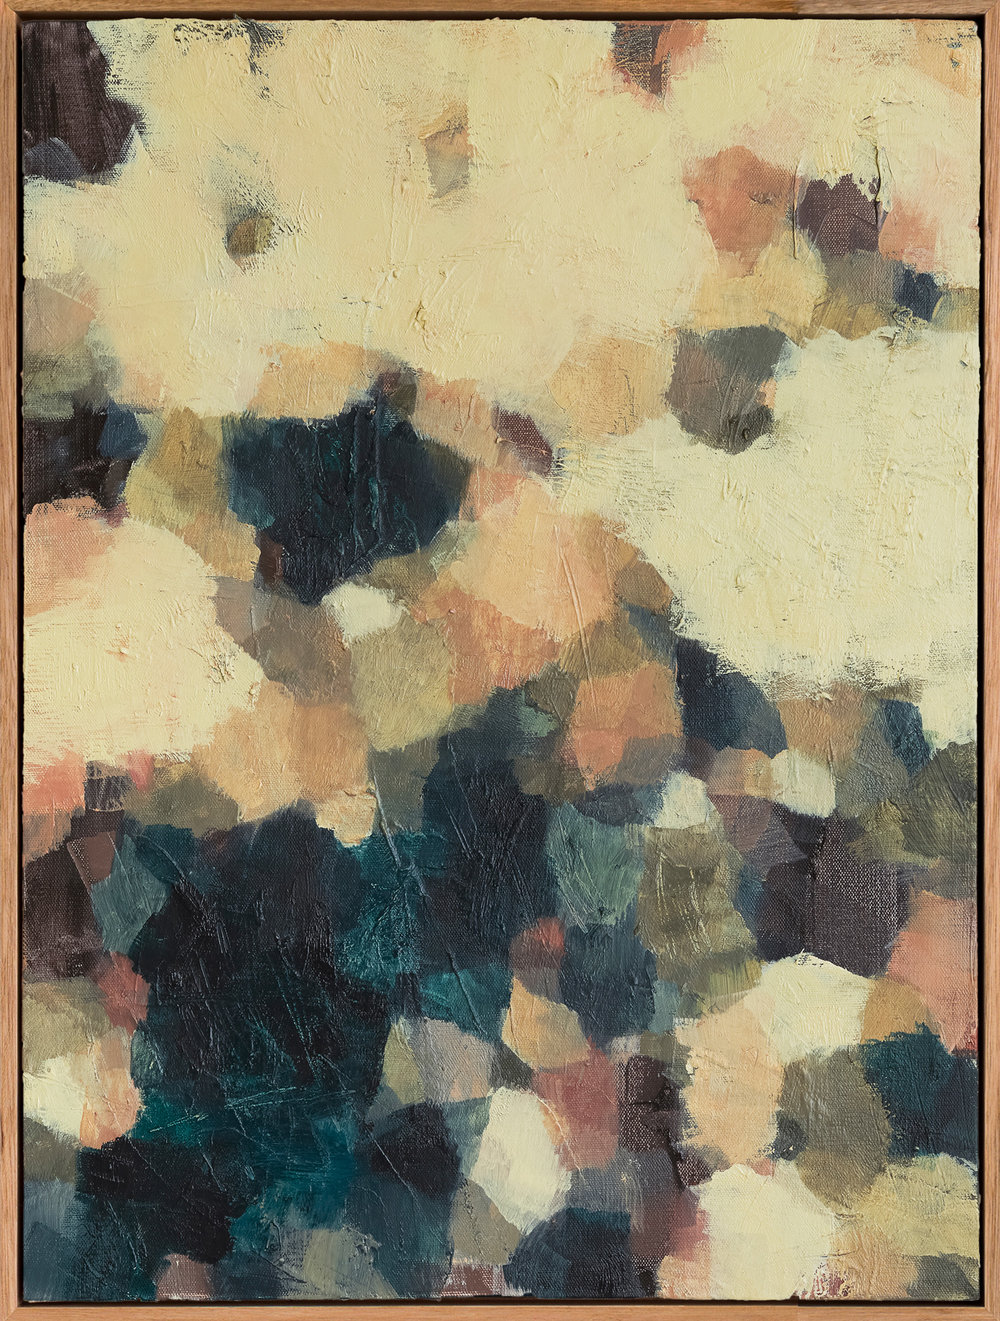 Fallen Light #2    2017 Oil on canvas, 61 x 46cm